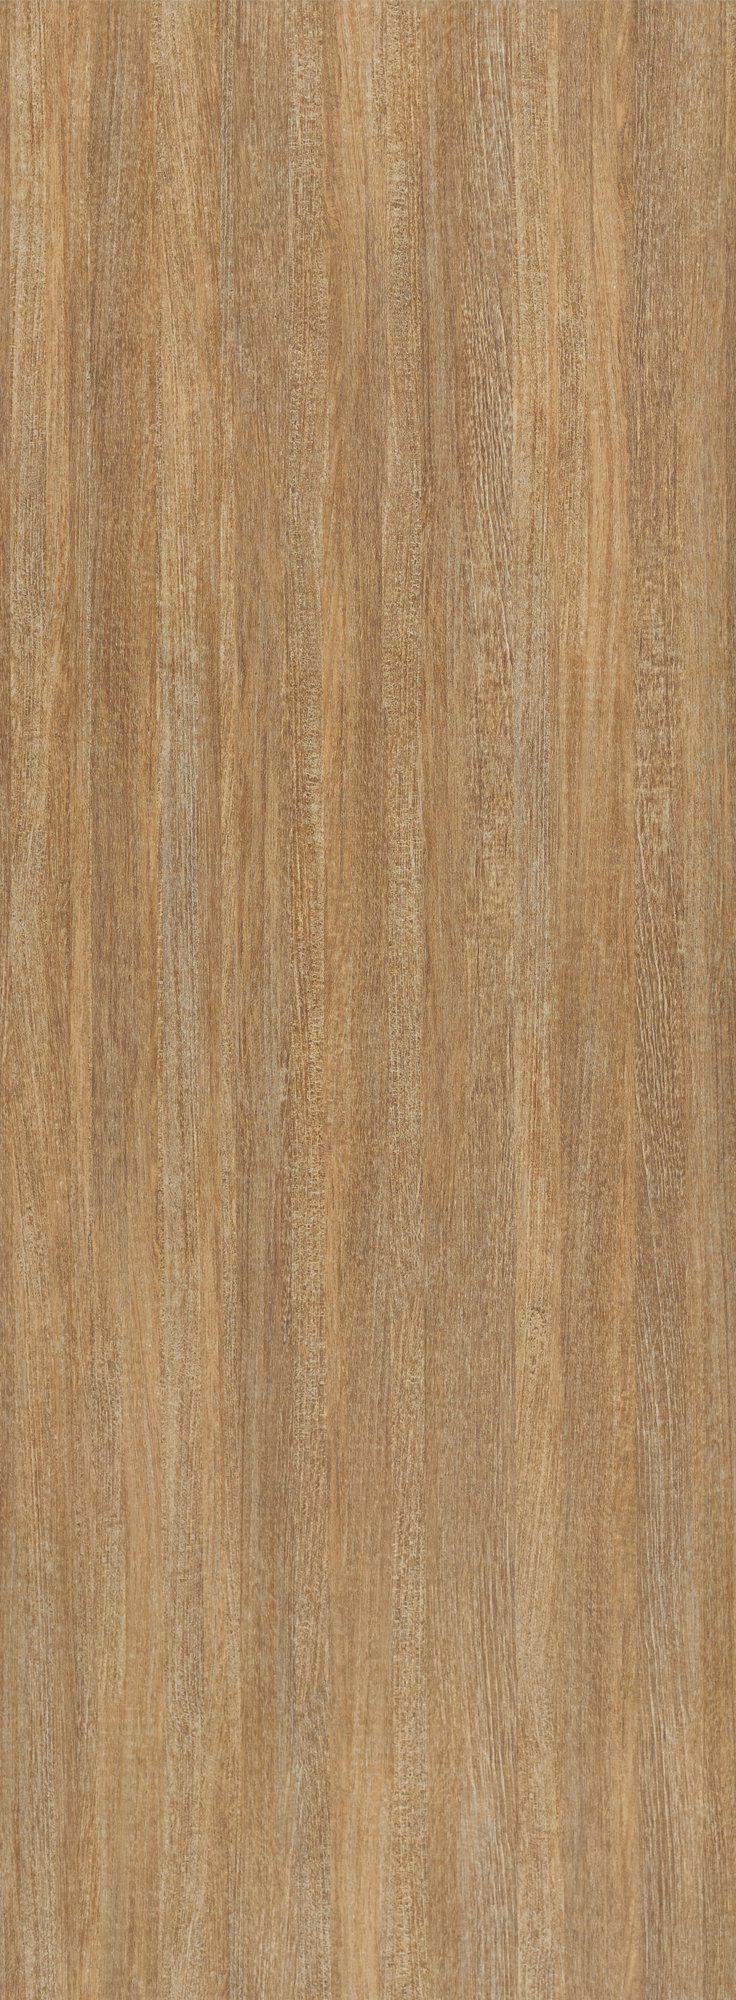 Wood Grain Laminate Samples ~ Best formica laminate woodgrains images on pinterest